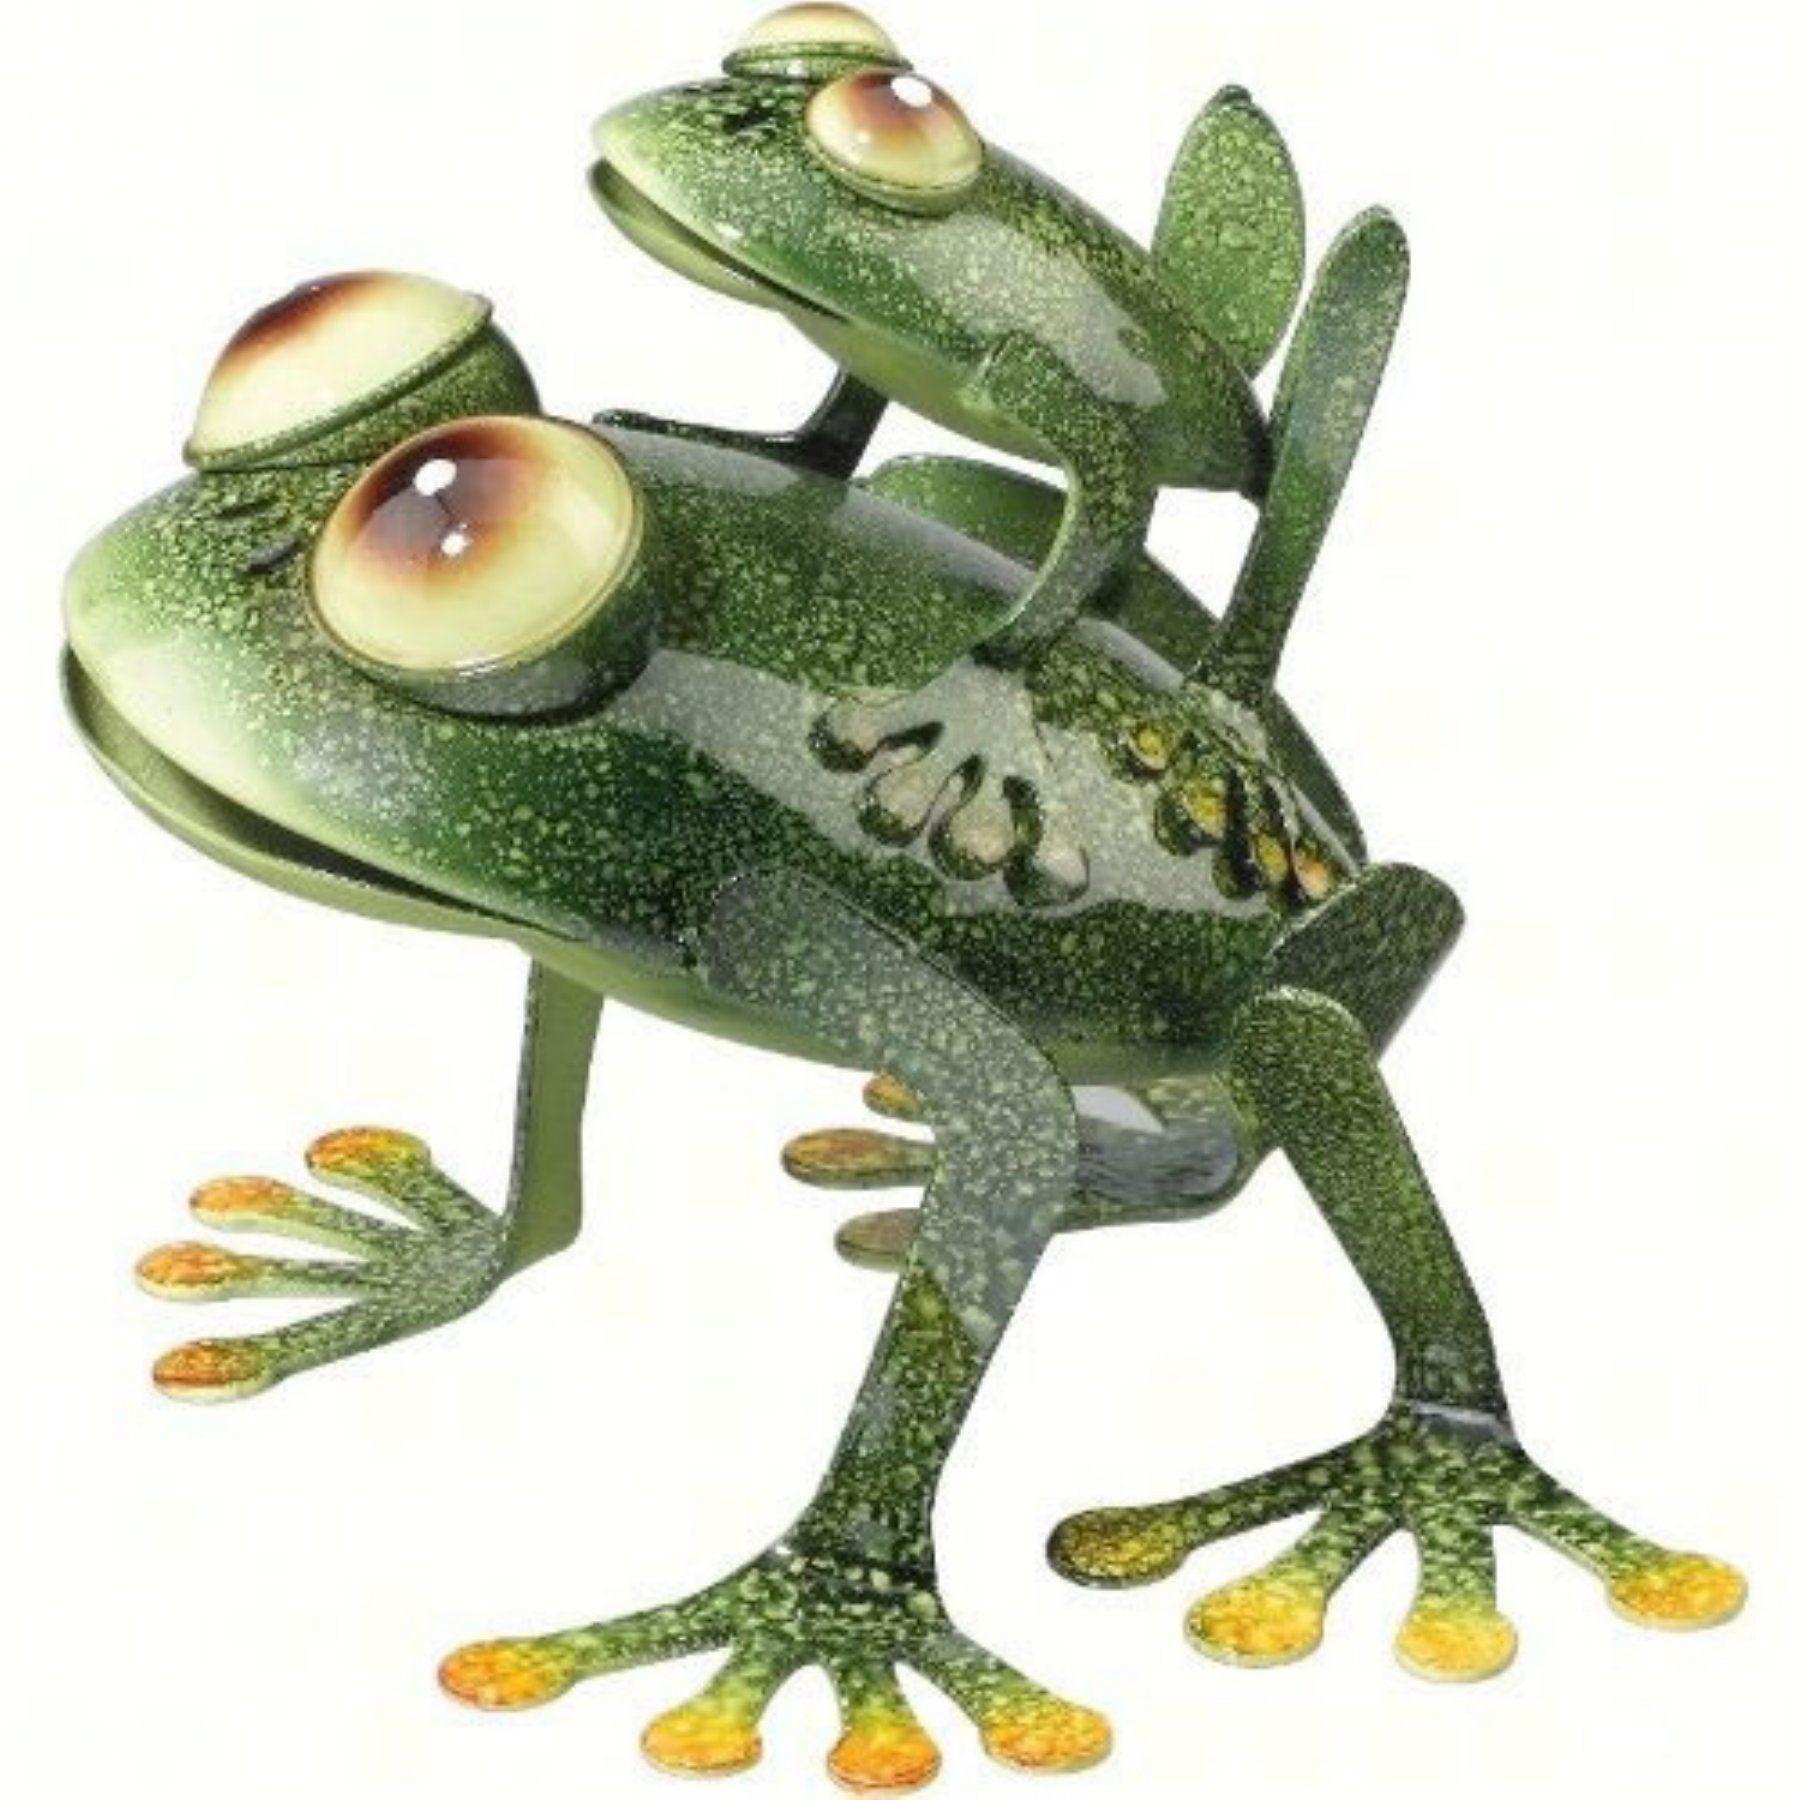 Regal Art and Gift Leap Frog Garden Decor - REGAL10267